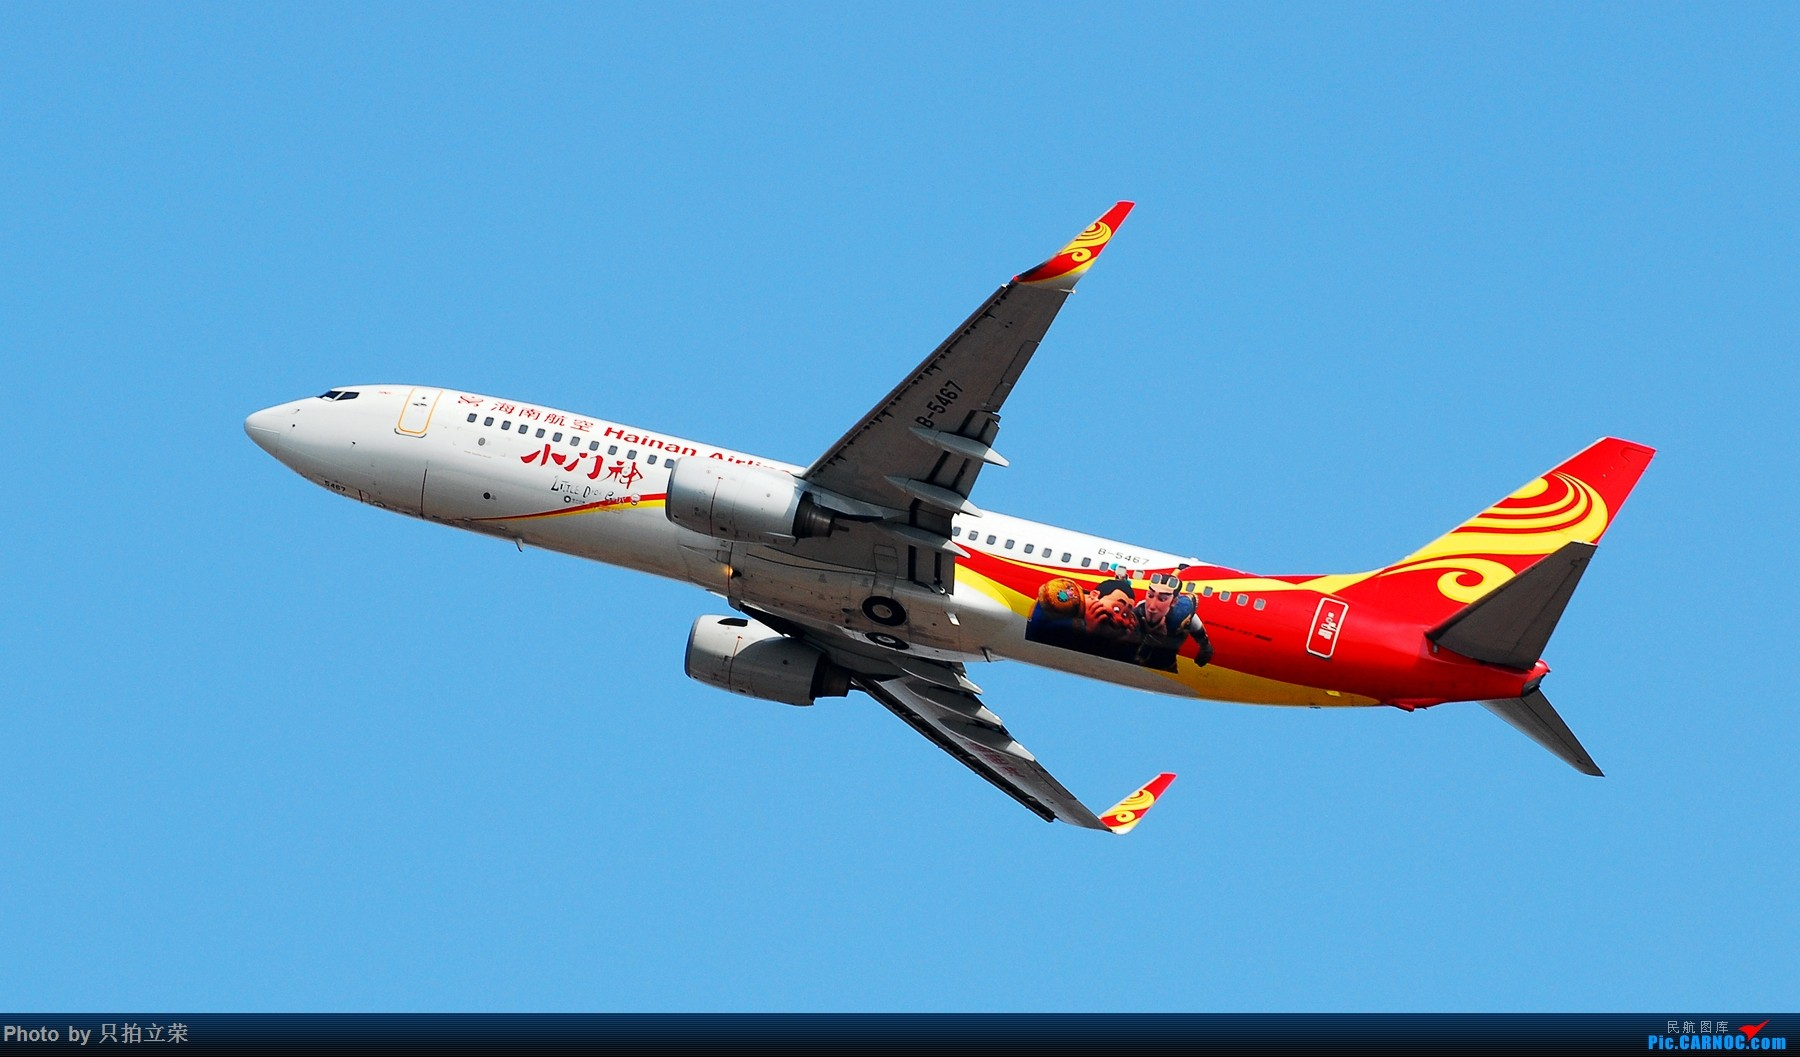 Re:[原创]长沙黄花好天来好机 BOEING 737-800 B-5467 中国长沙黄花国际机场